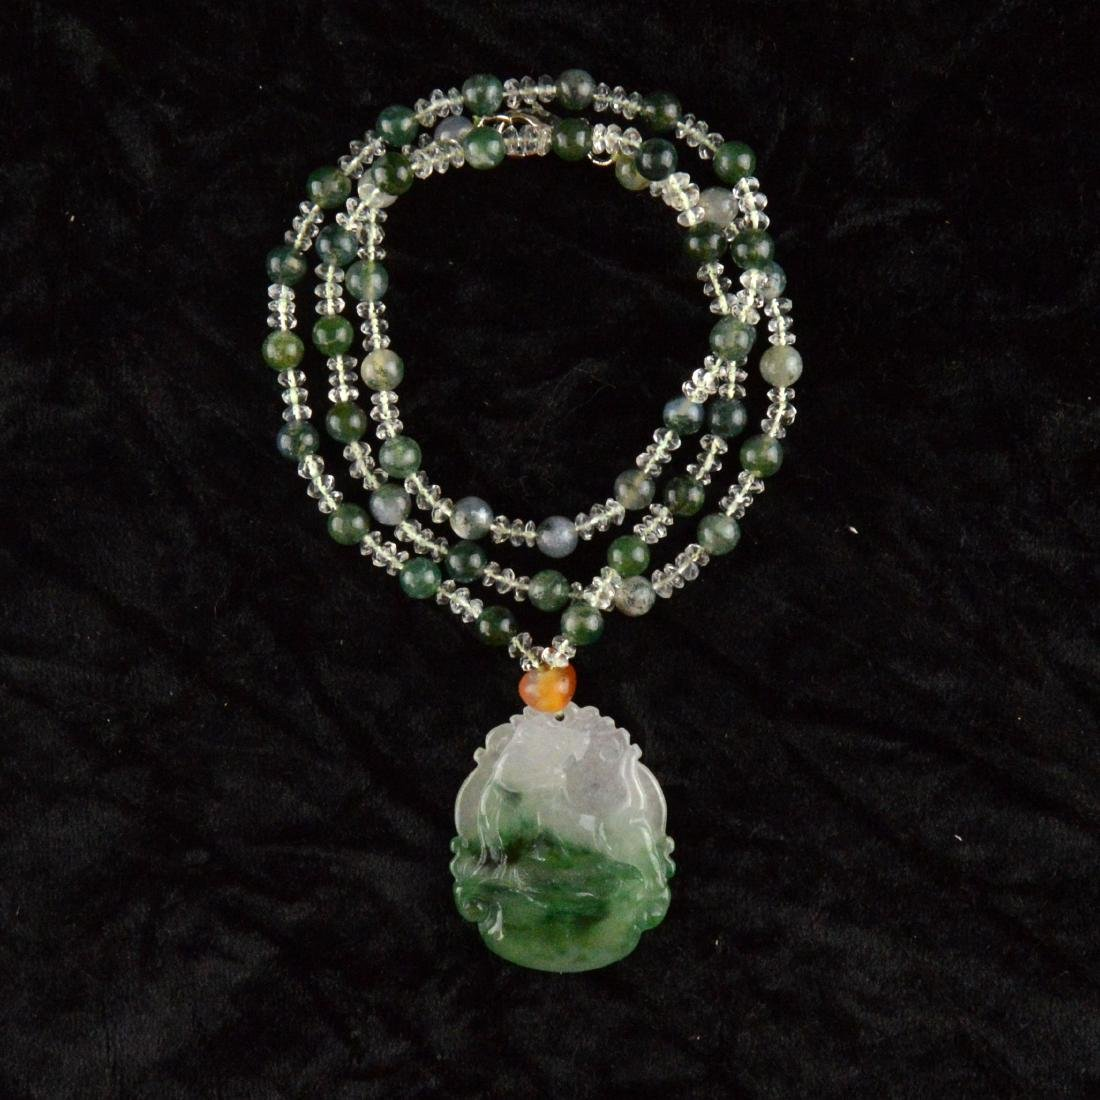 Jadeite Pendant Necklace